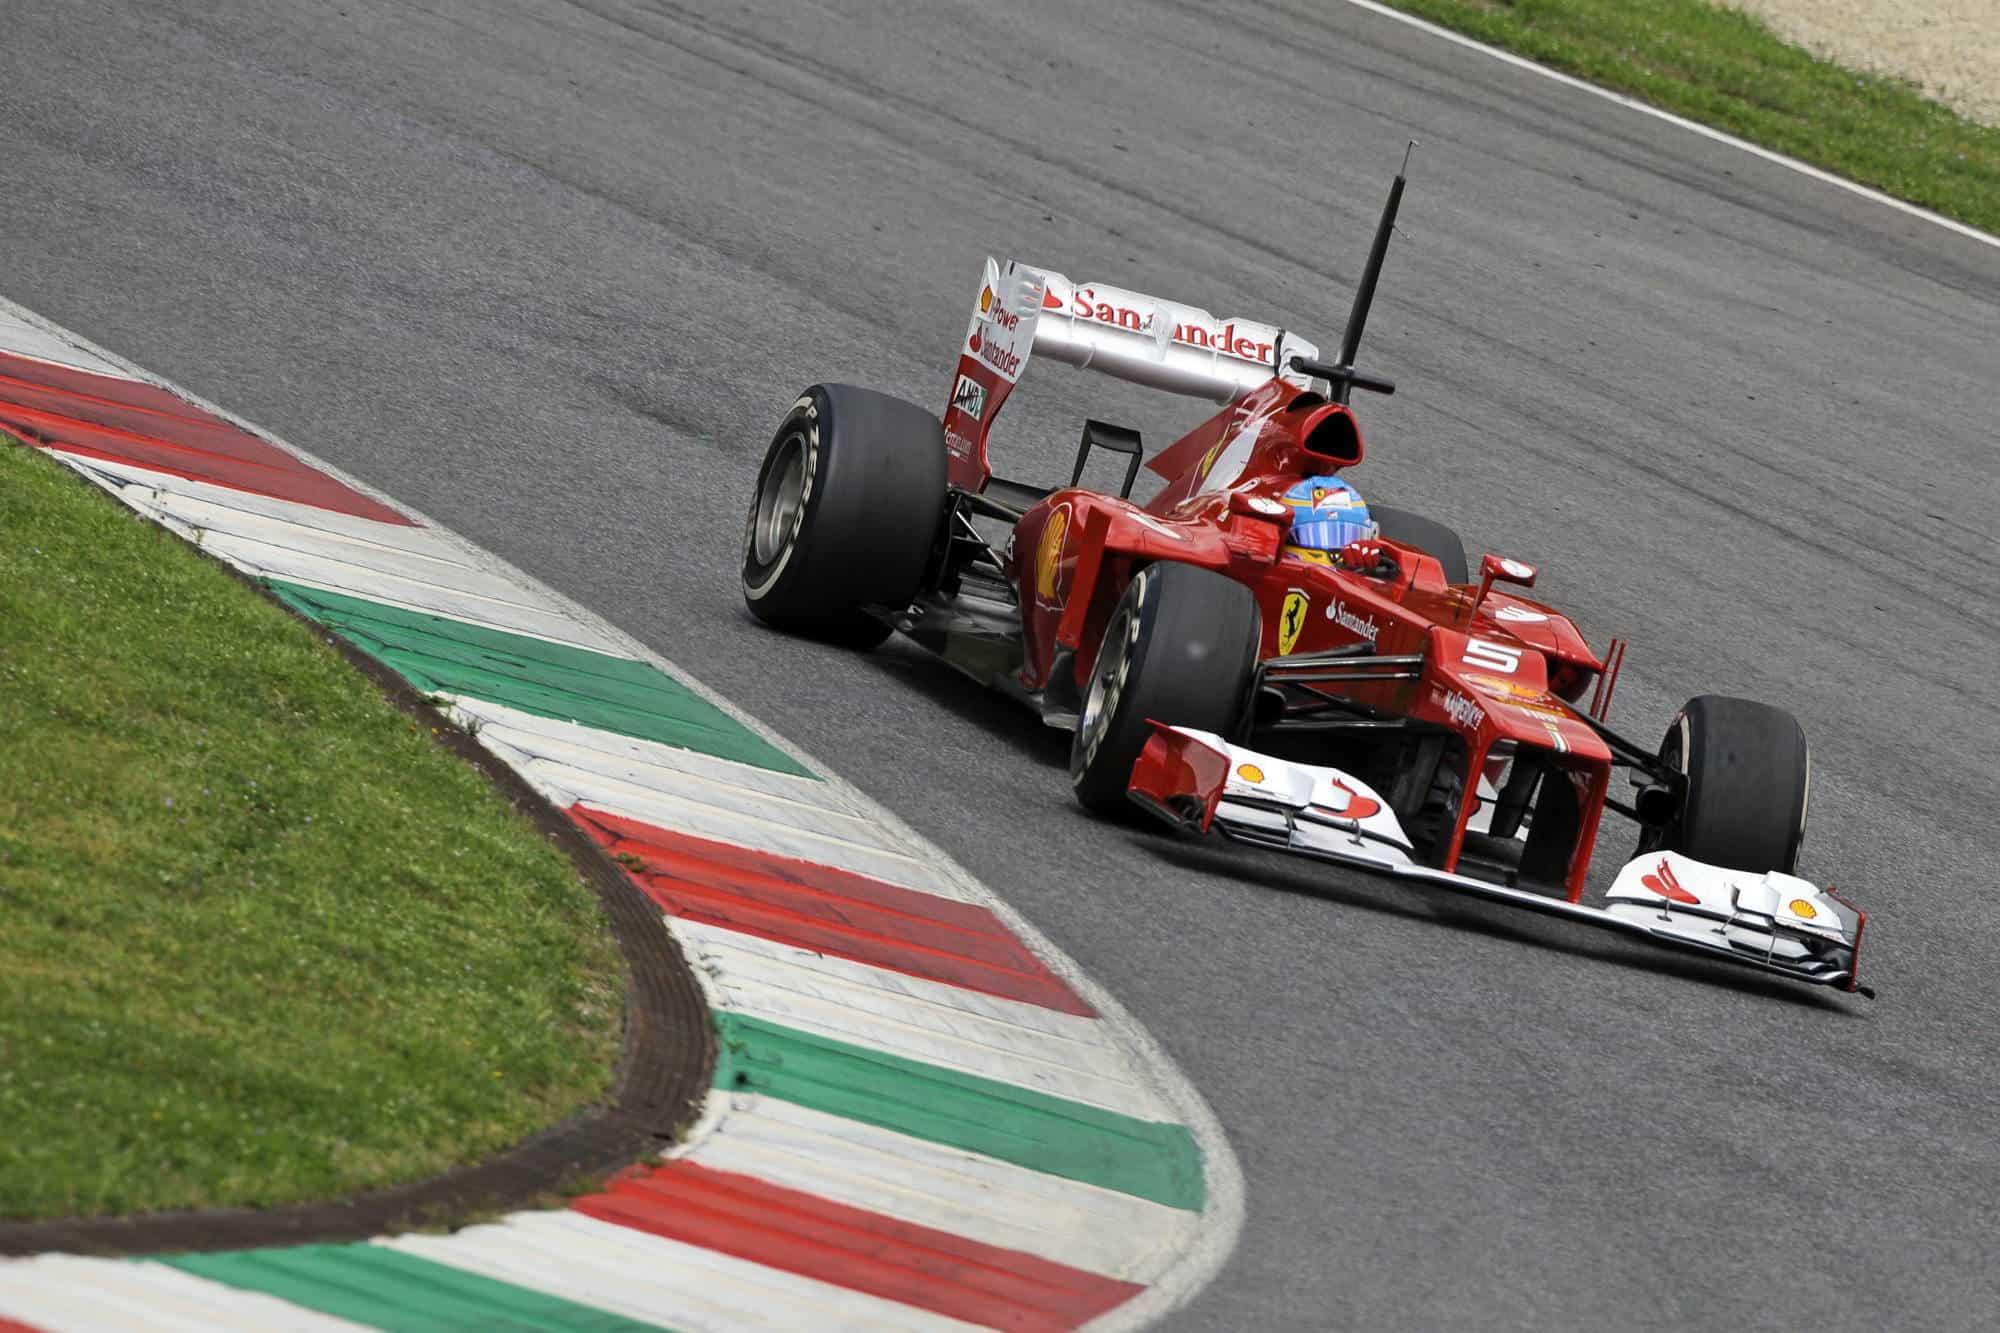 2012 Mugello F1 in season test Alonso Ferrari F2012 Photo Ferrari